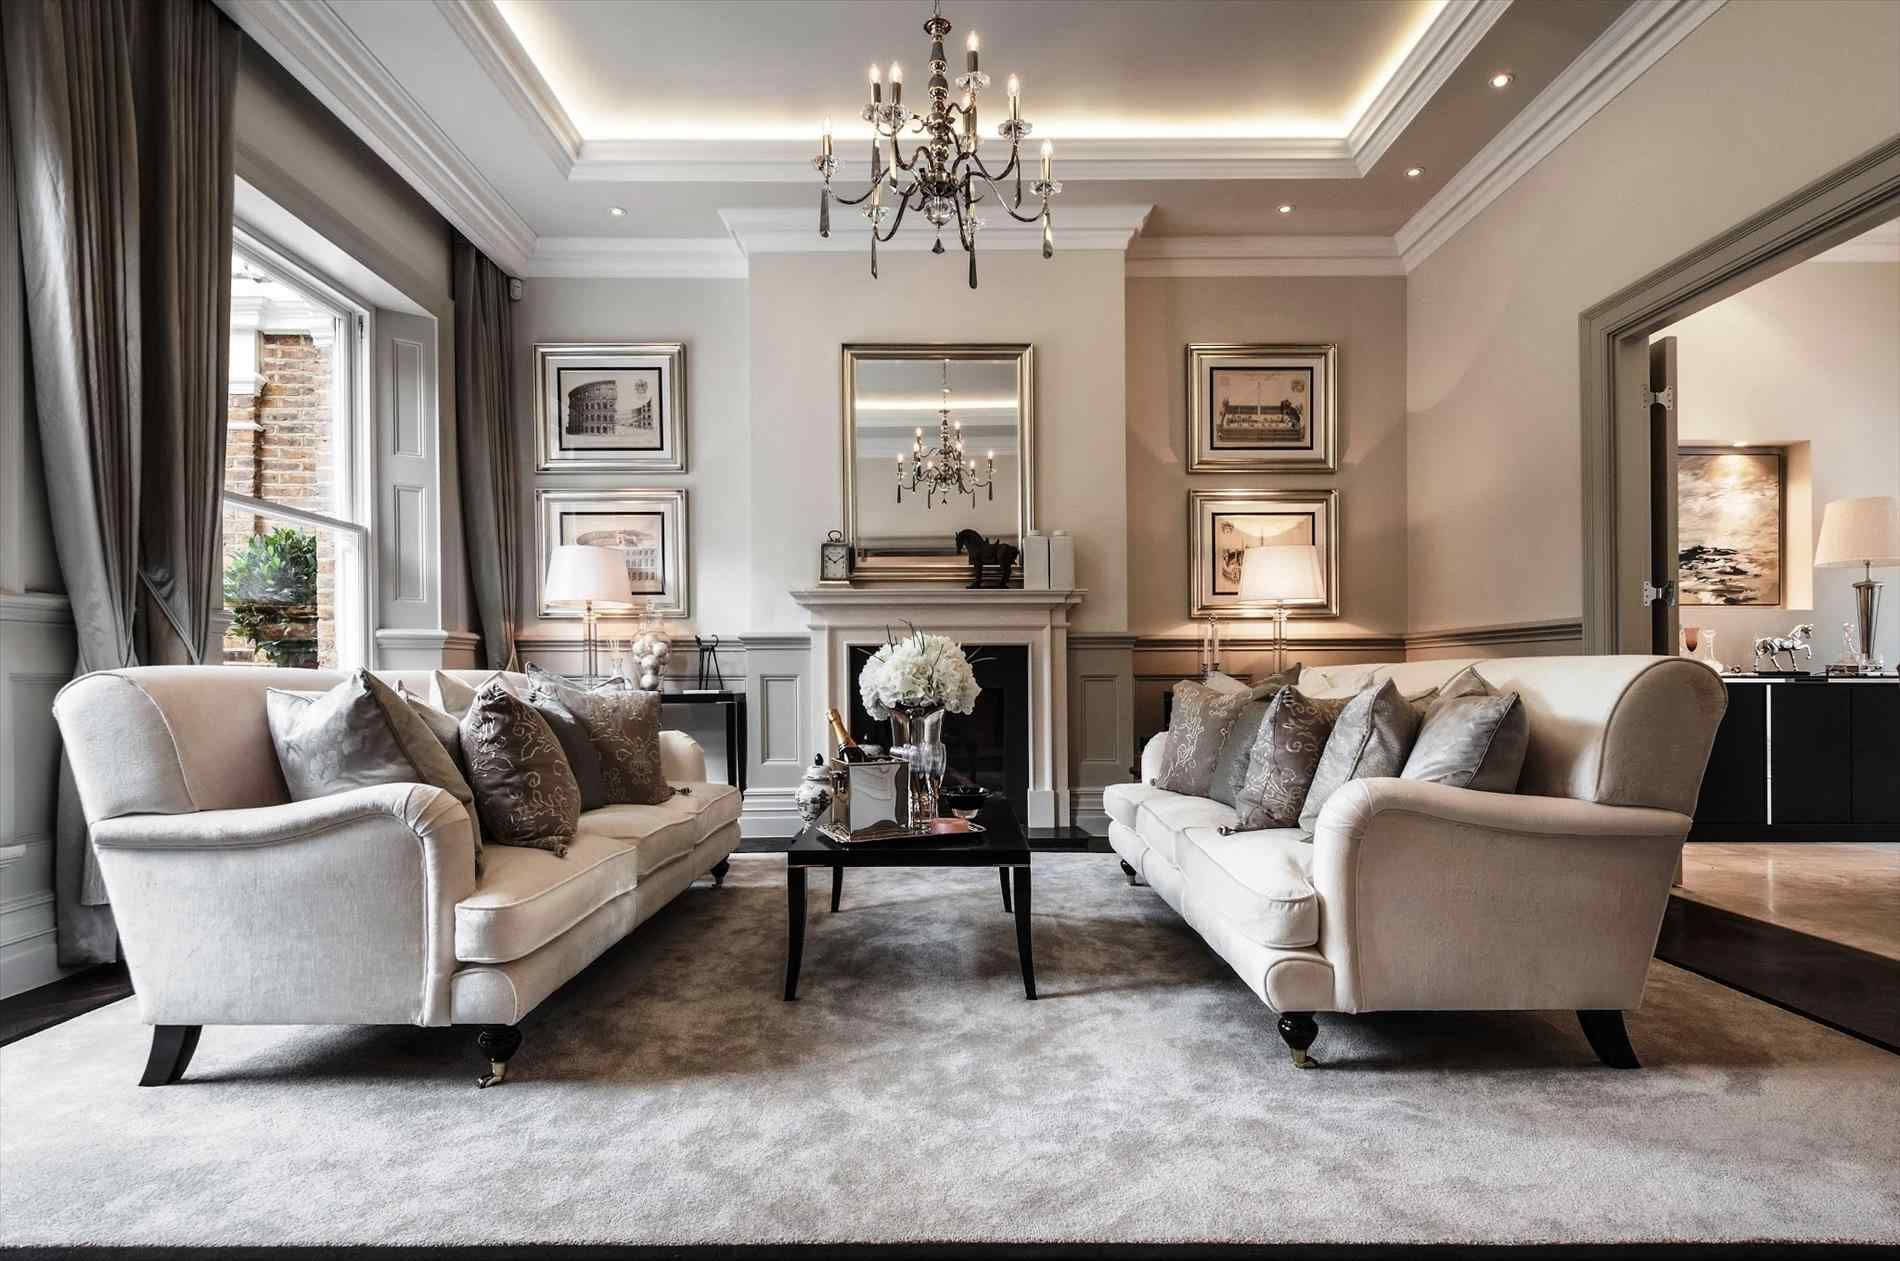 Image Result For Modern Traditional Living Room Roskoshnye Gostinye Dizajn Gostinoj Interer #traditional #living #room #pictures